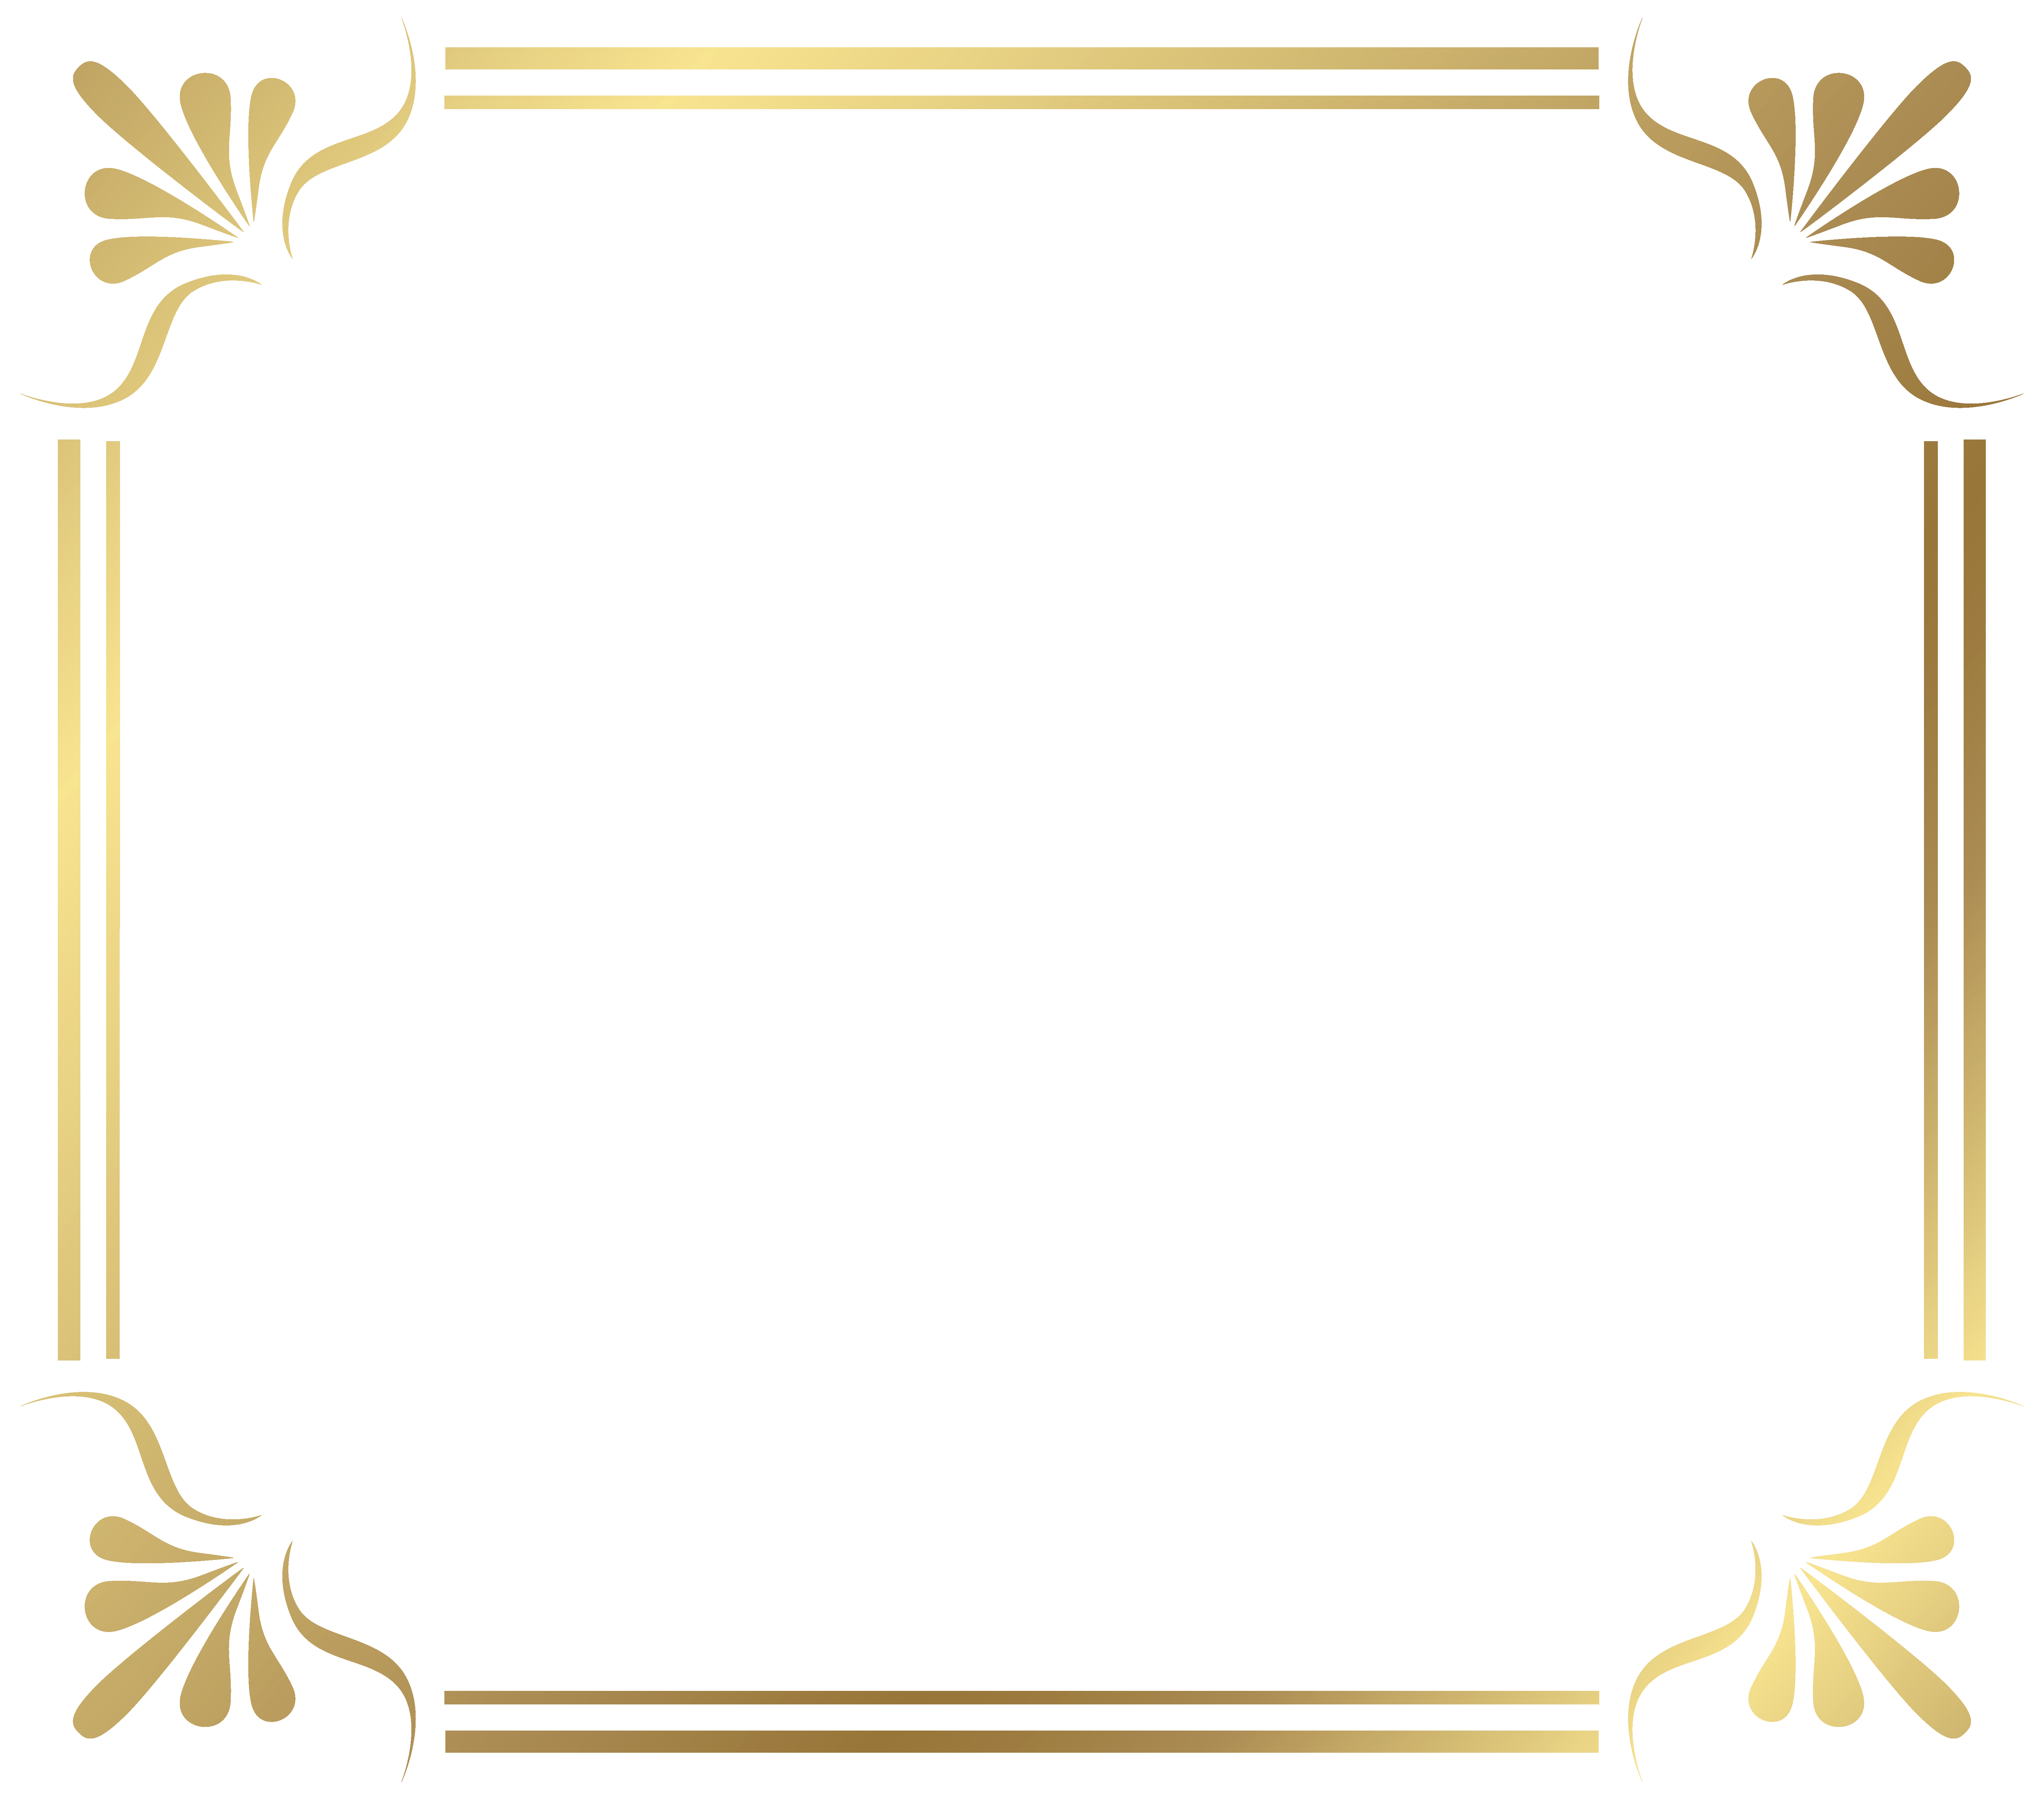 Free Gold Border Templates Fresh Gold Frame Png Transparent Free Download